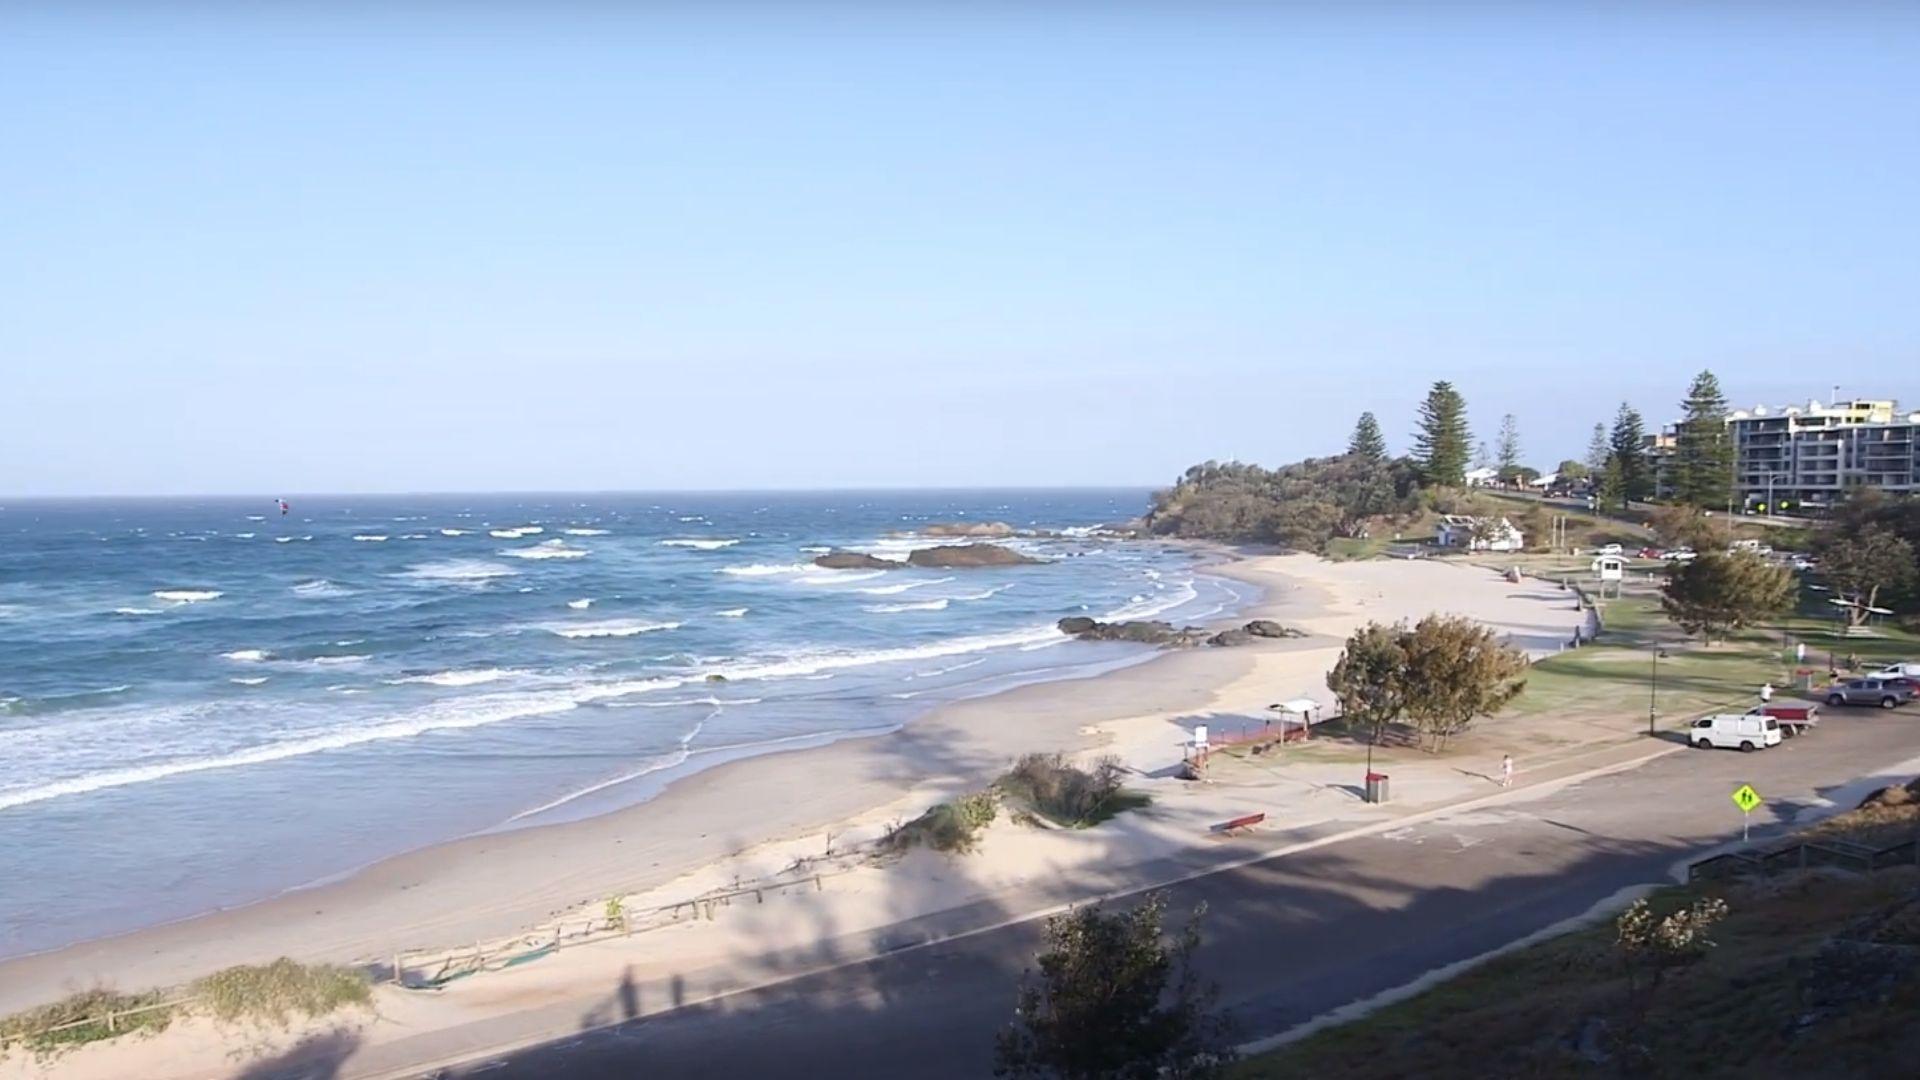 Charles Sturt unveils refresh to Munster Street site in Port Macquarie